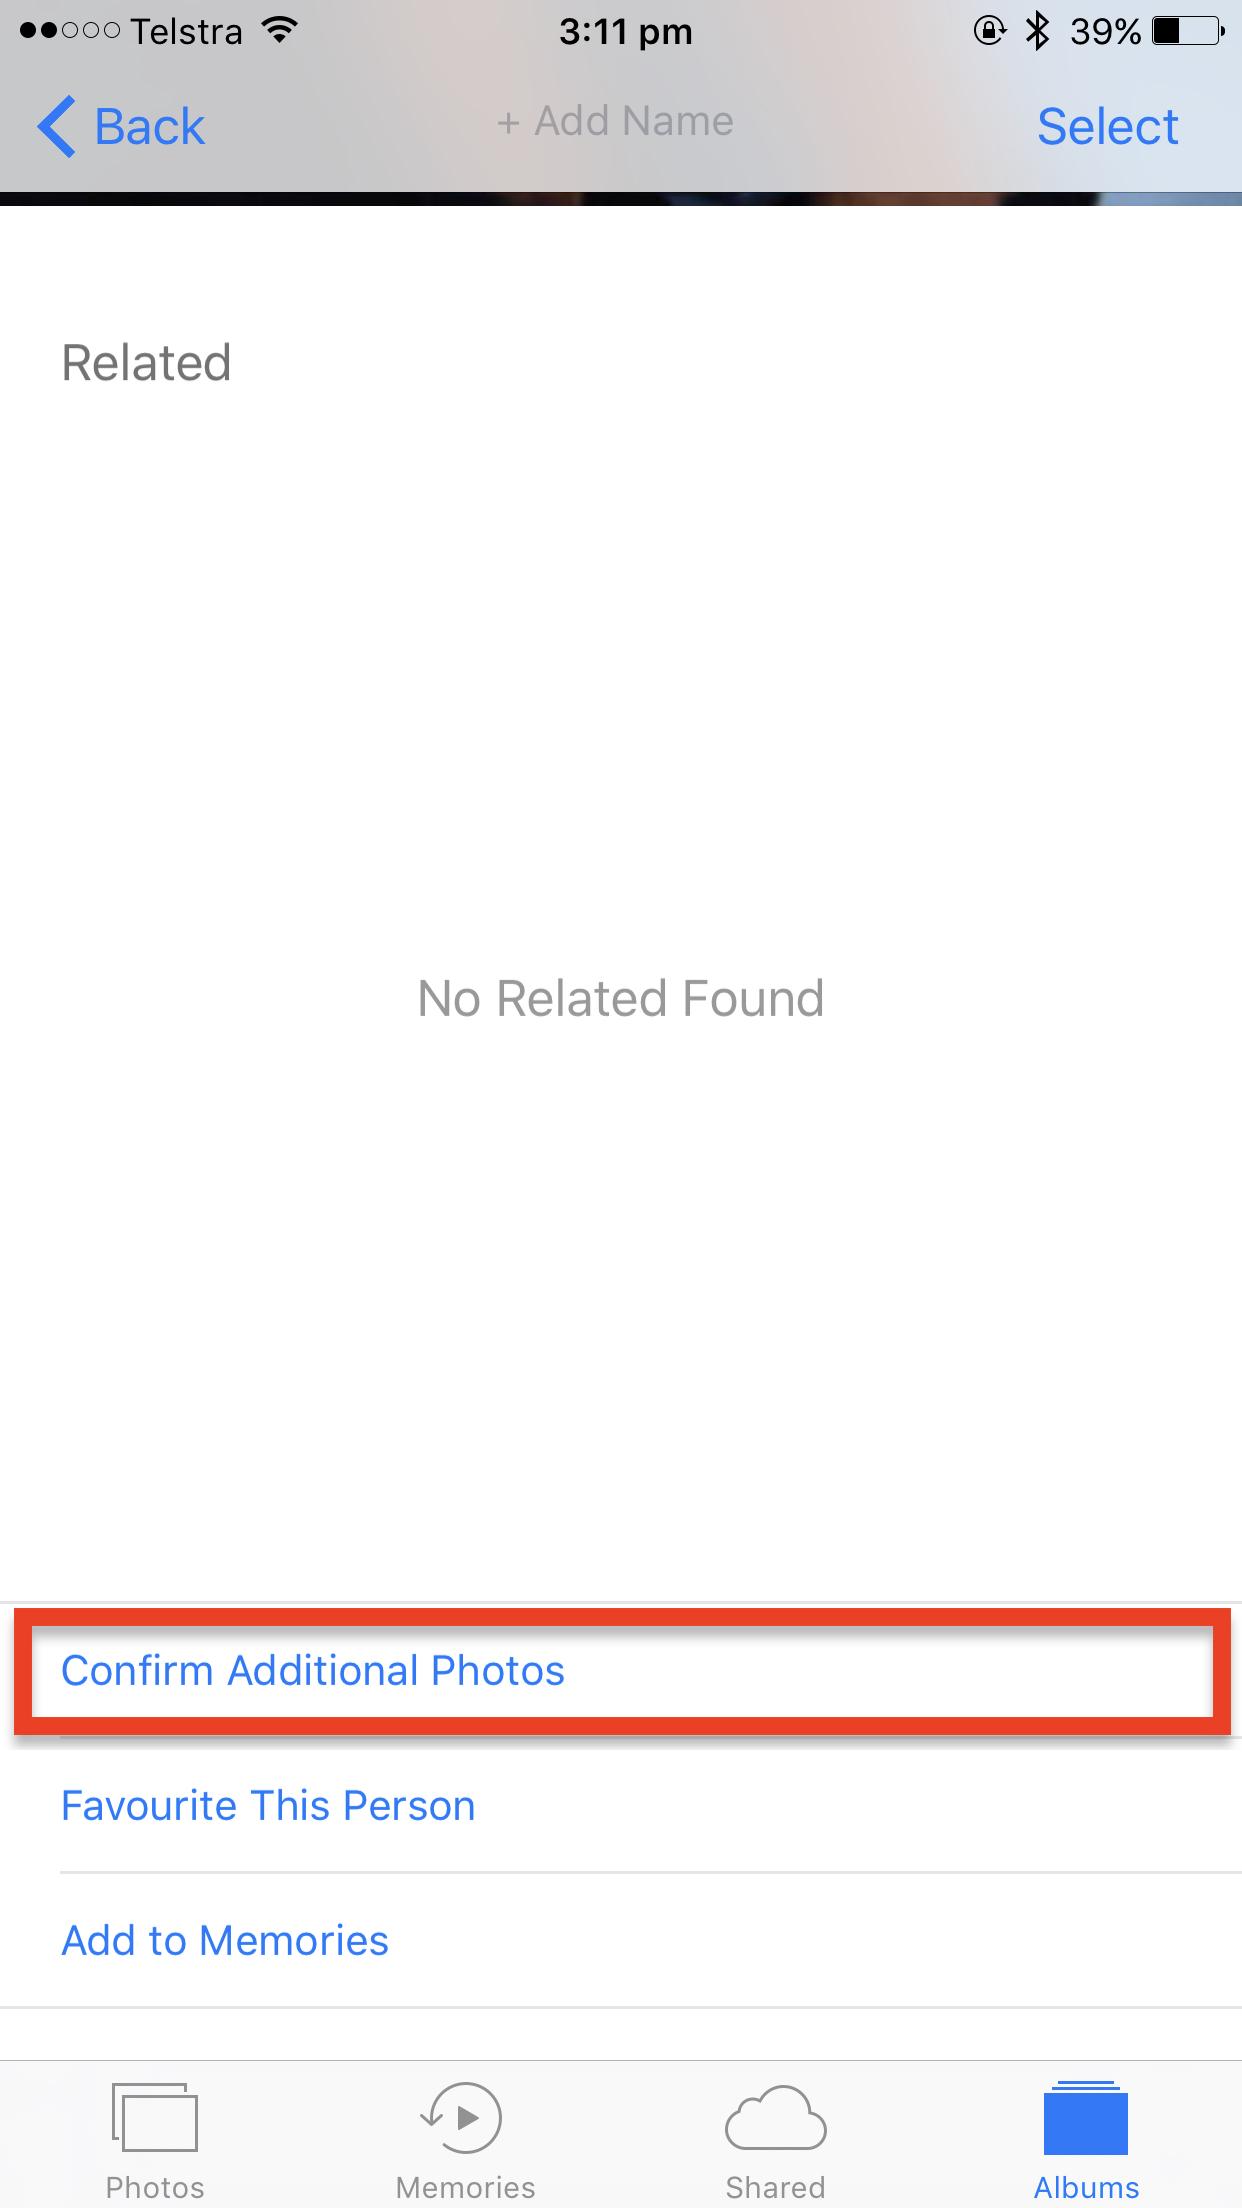 Confirm additional photos